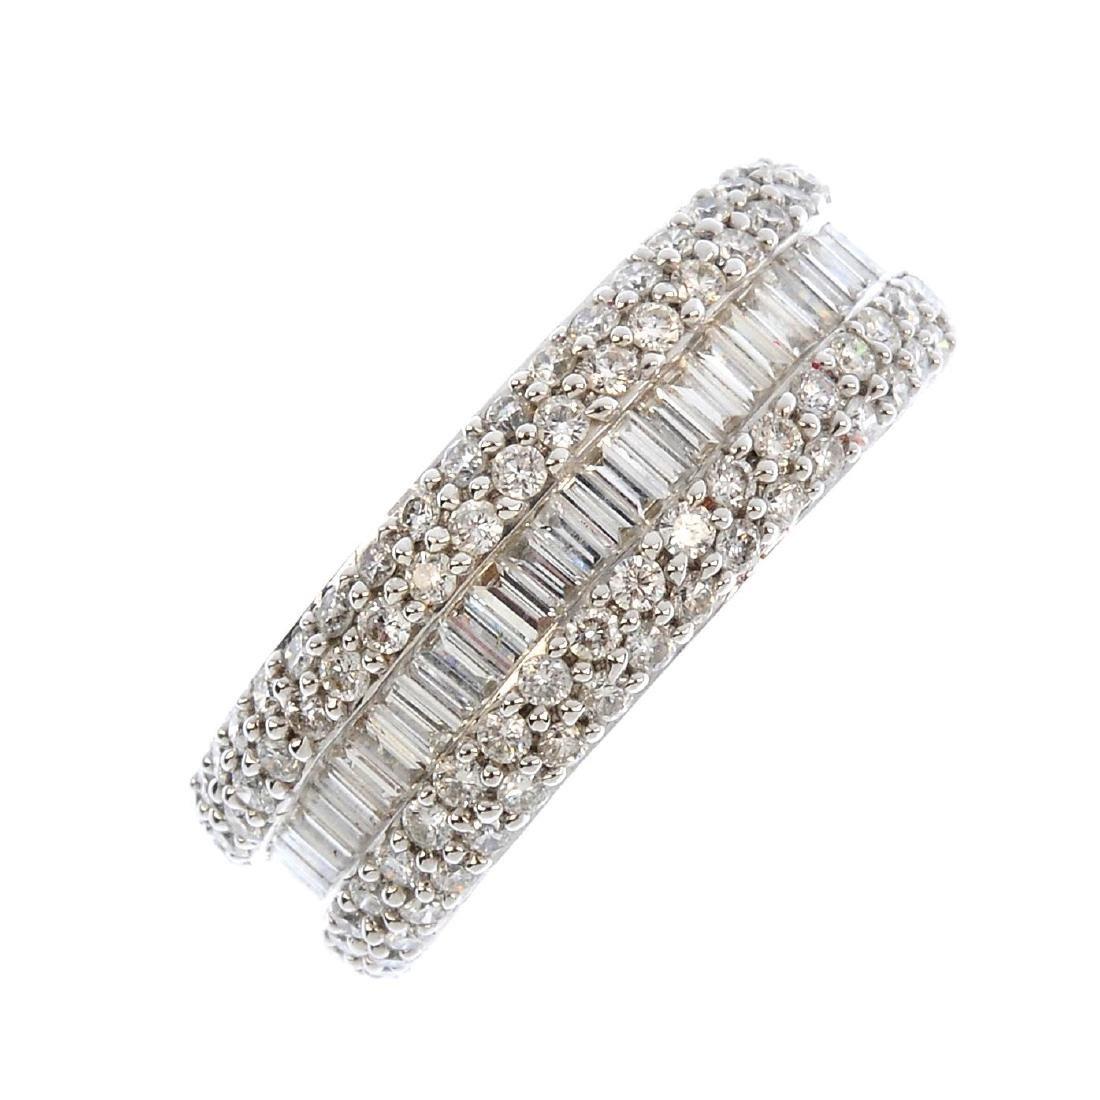 An 18ct gold diamond ring. The baguette-cut diamond